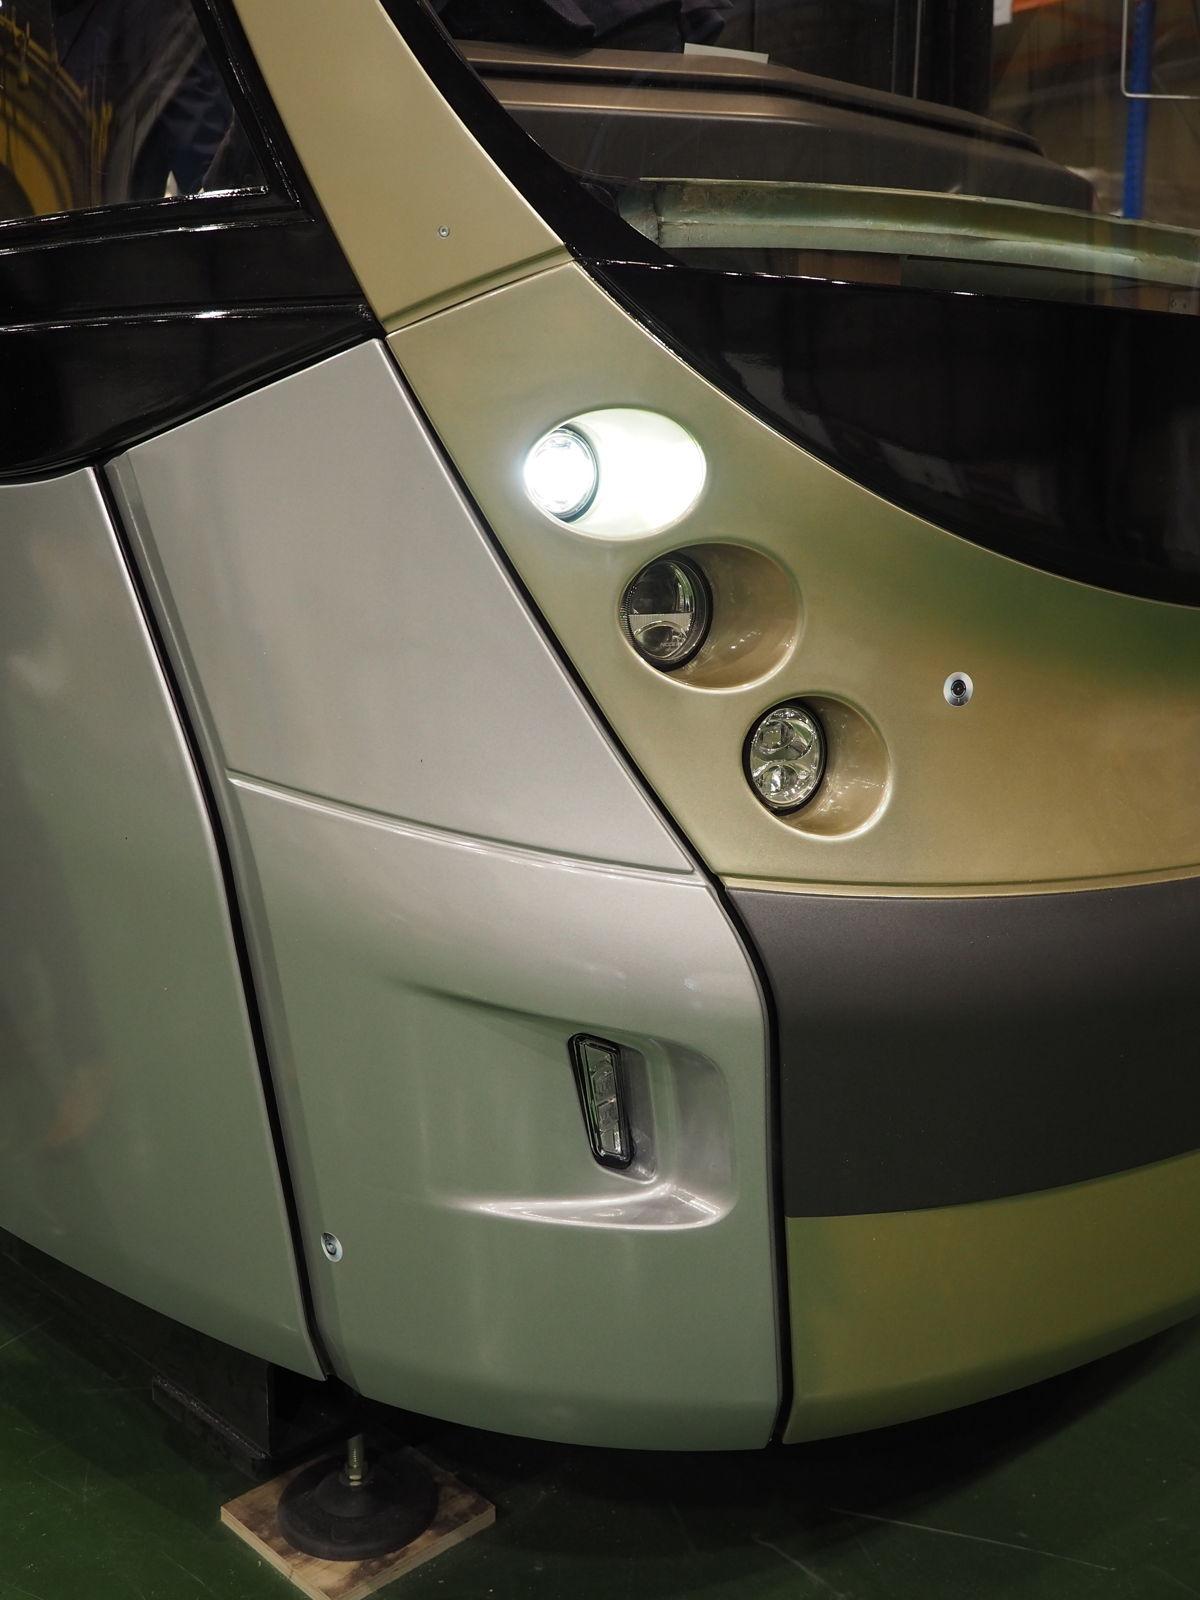 Tram New Generation